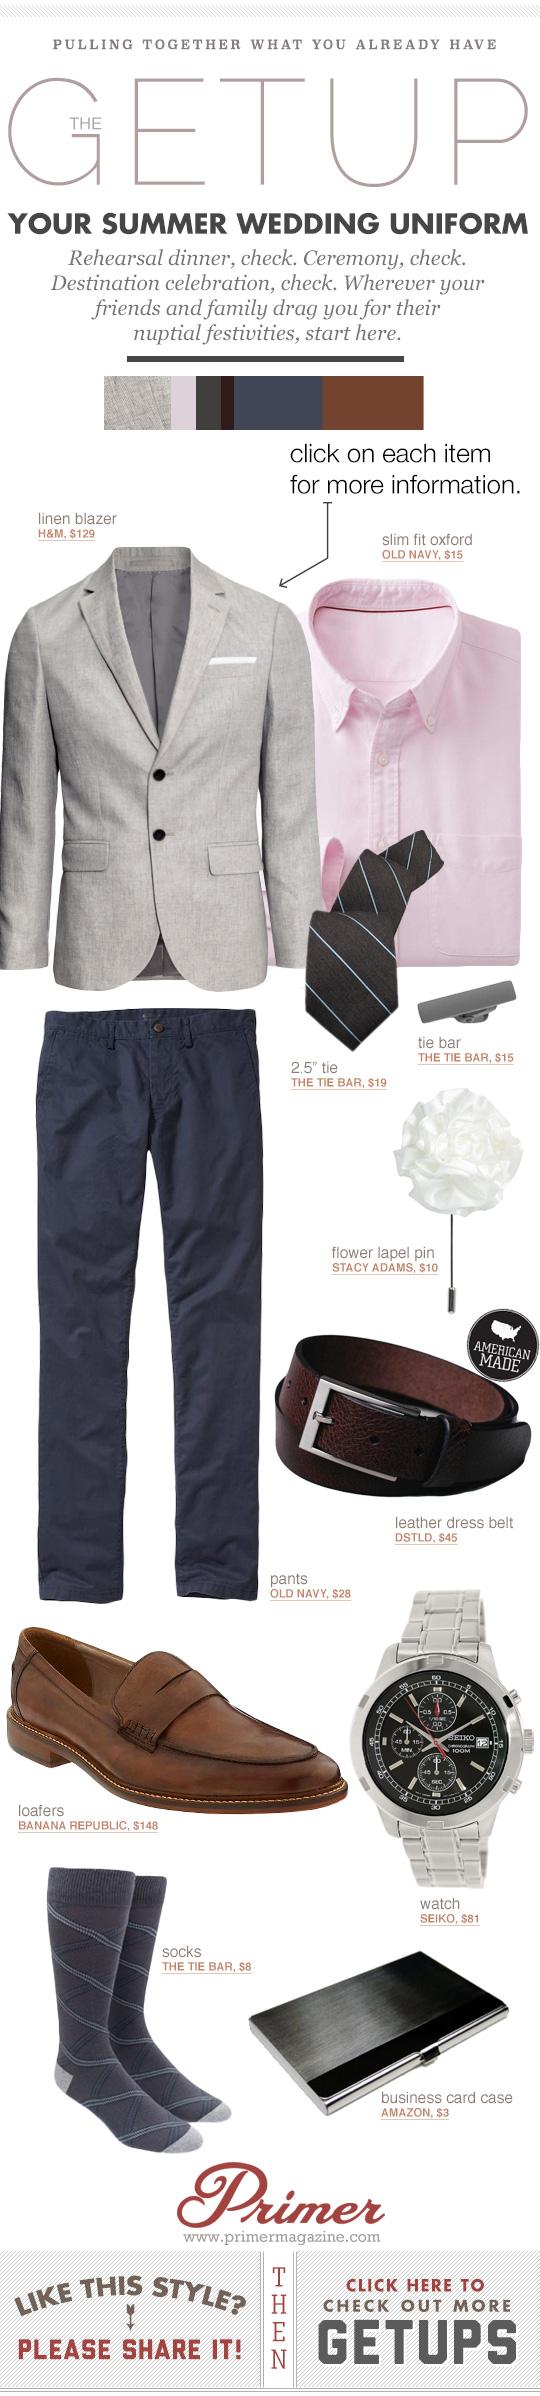 Getup Summer Wedding Uniform - gray blazer, shirt and tie, blue pants